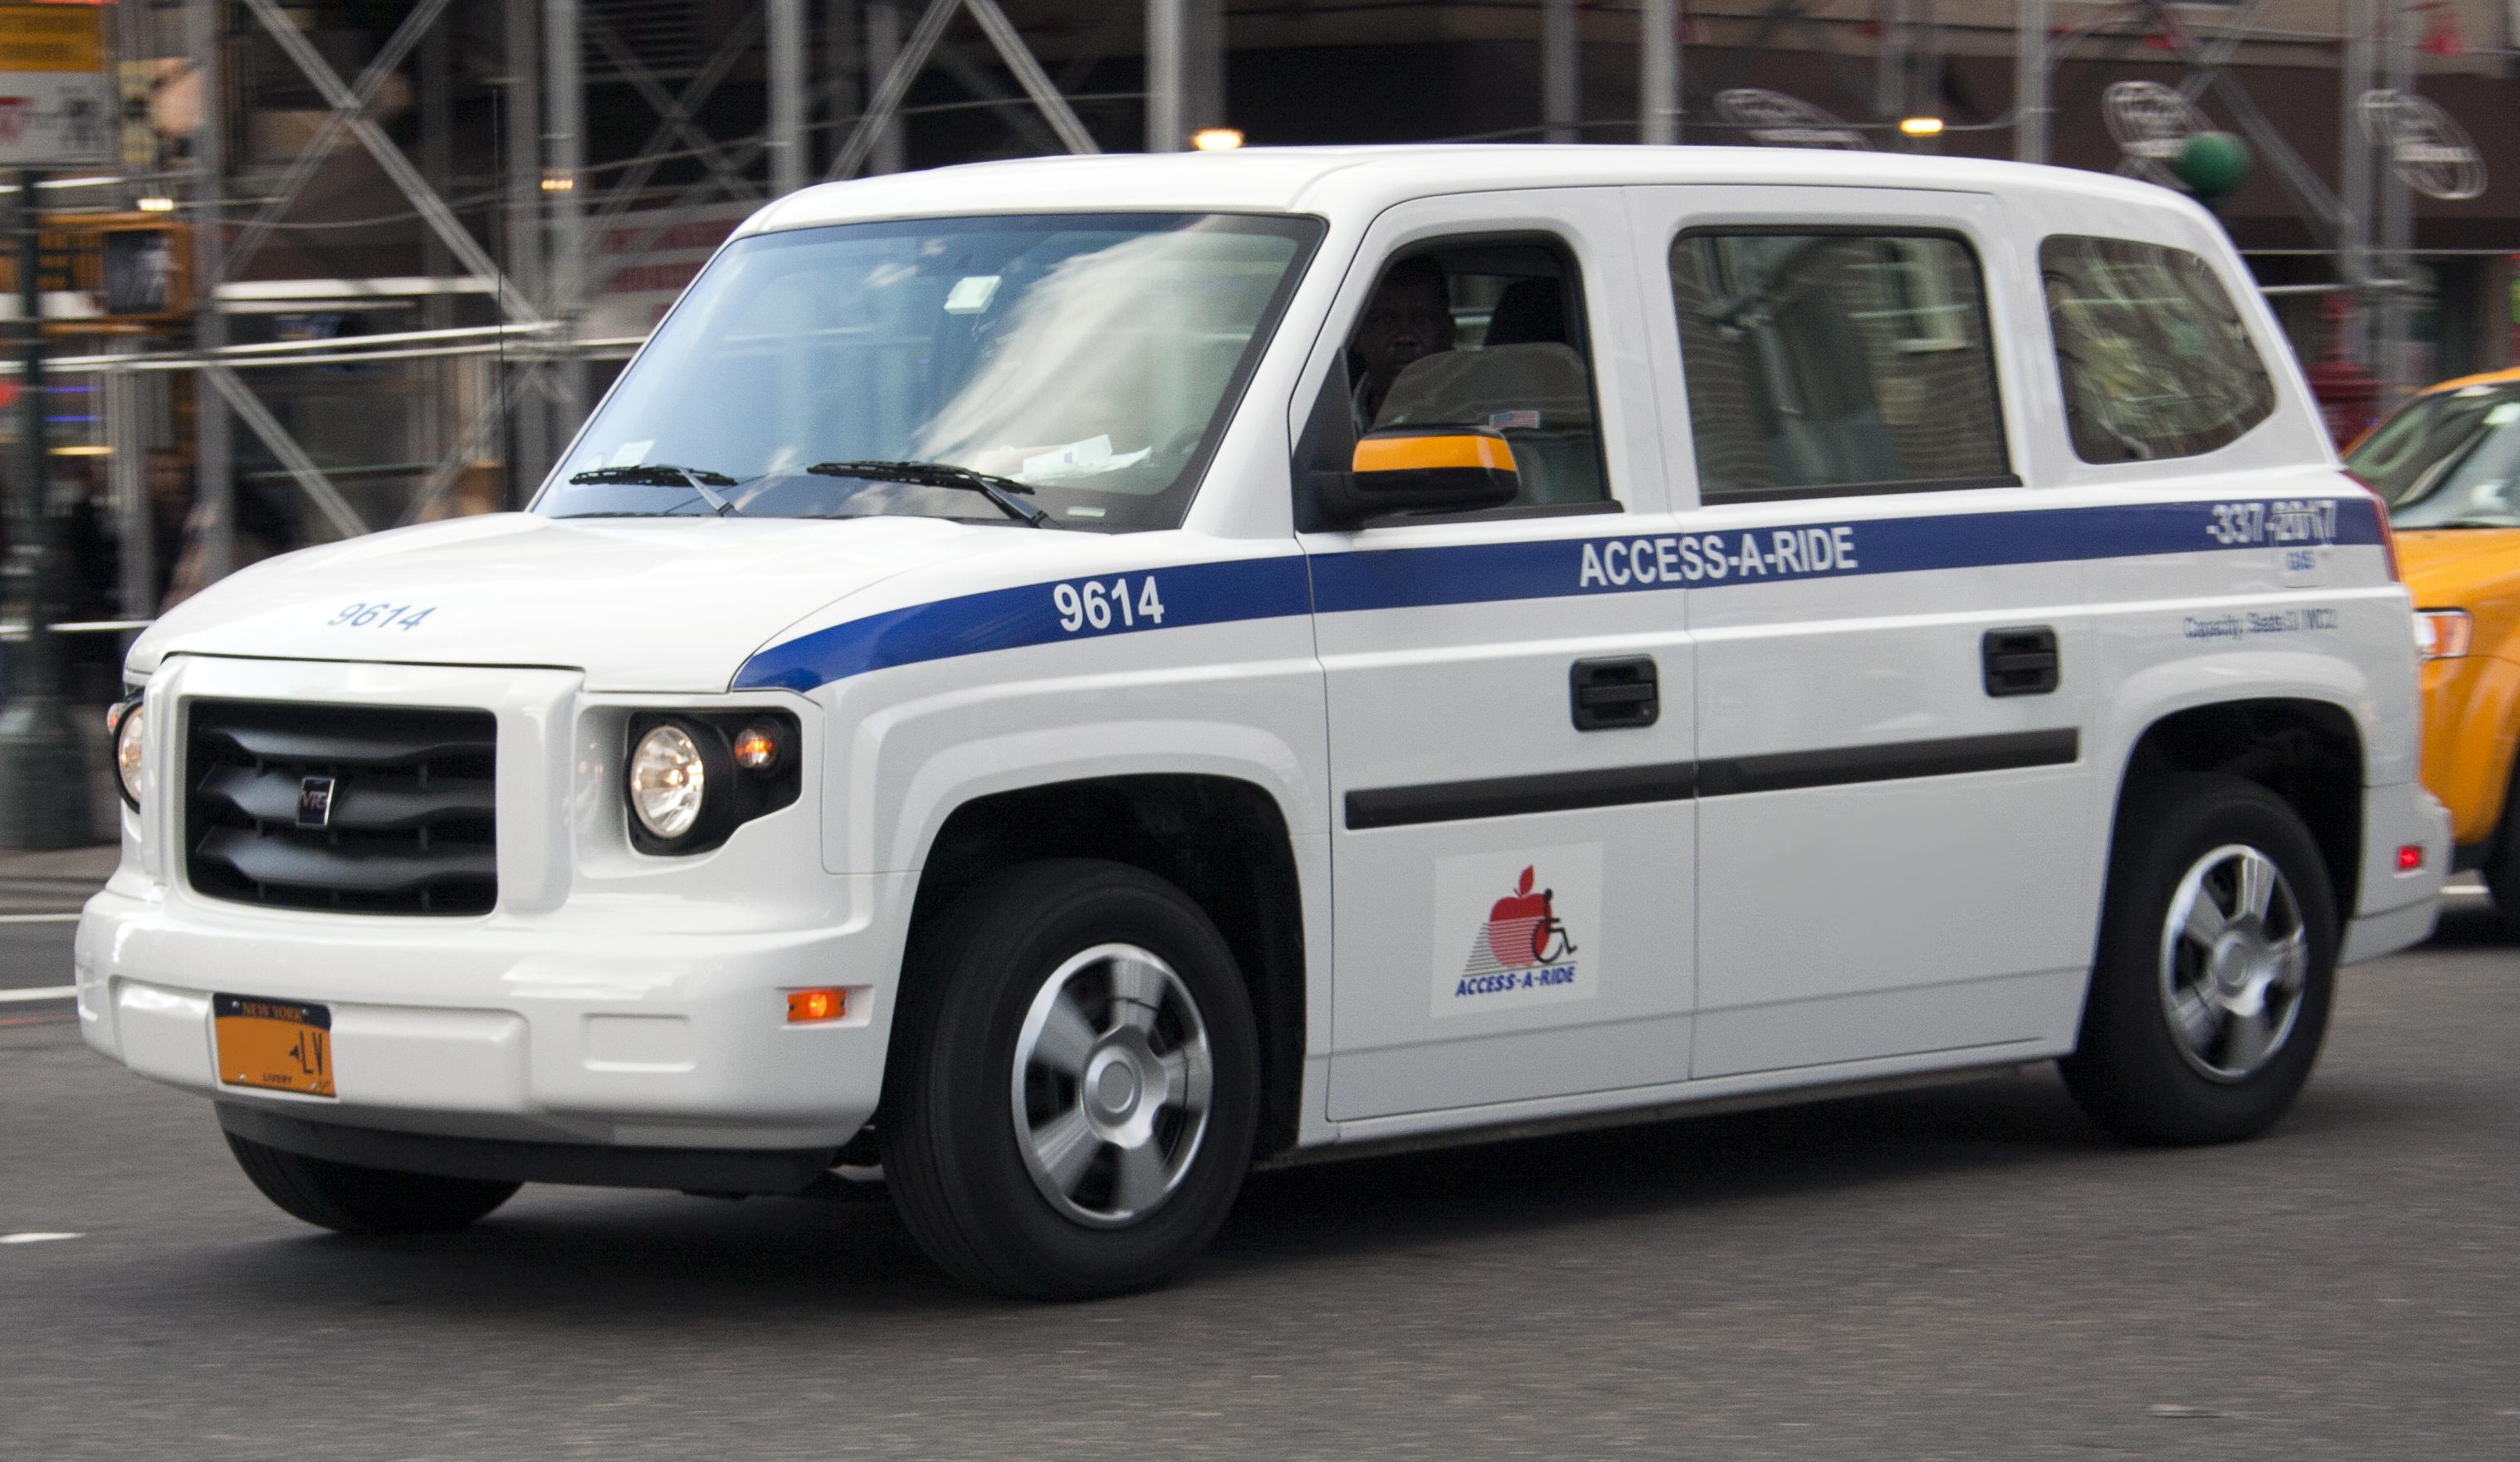 Access Services Cars That Govt Provides